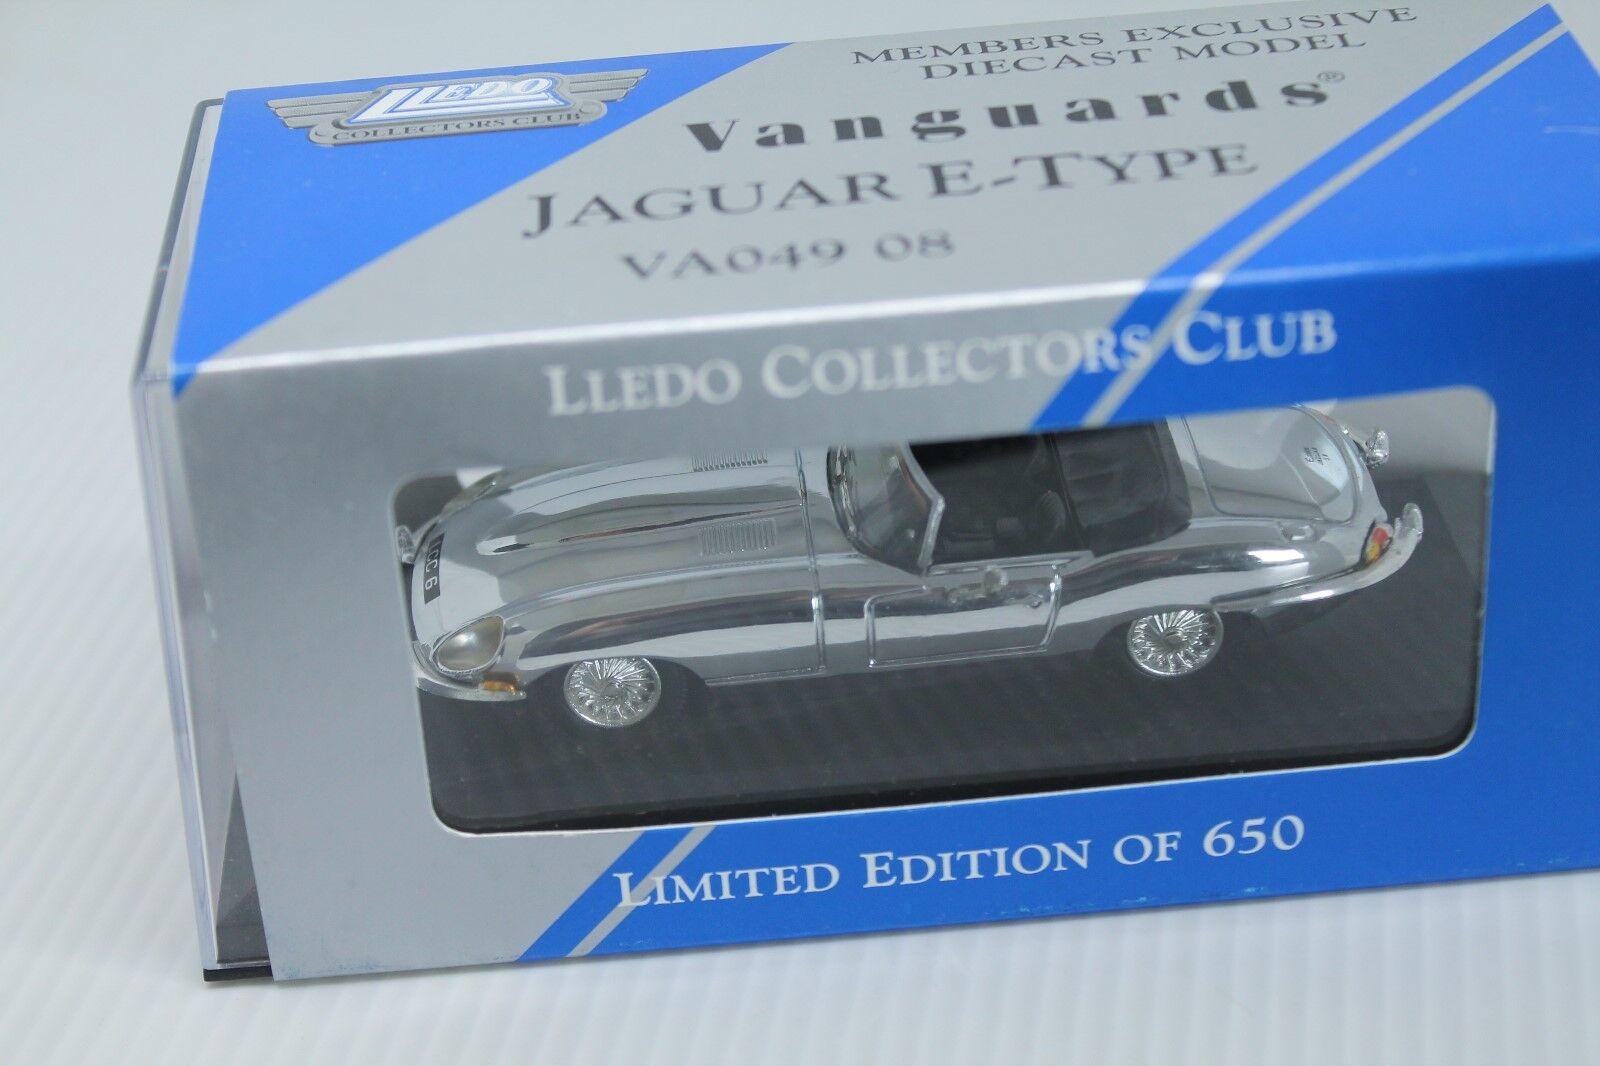 Vanguards Corgi ()  JAGUAR E-TYPE  OVP  1 43  Limited 650 pieces